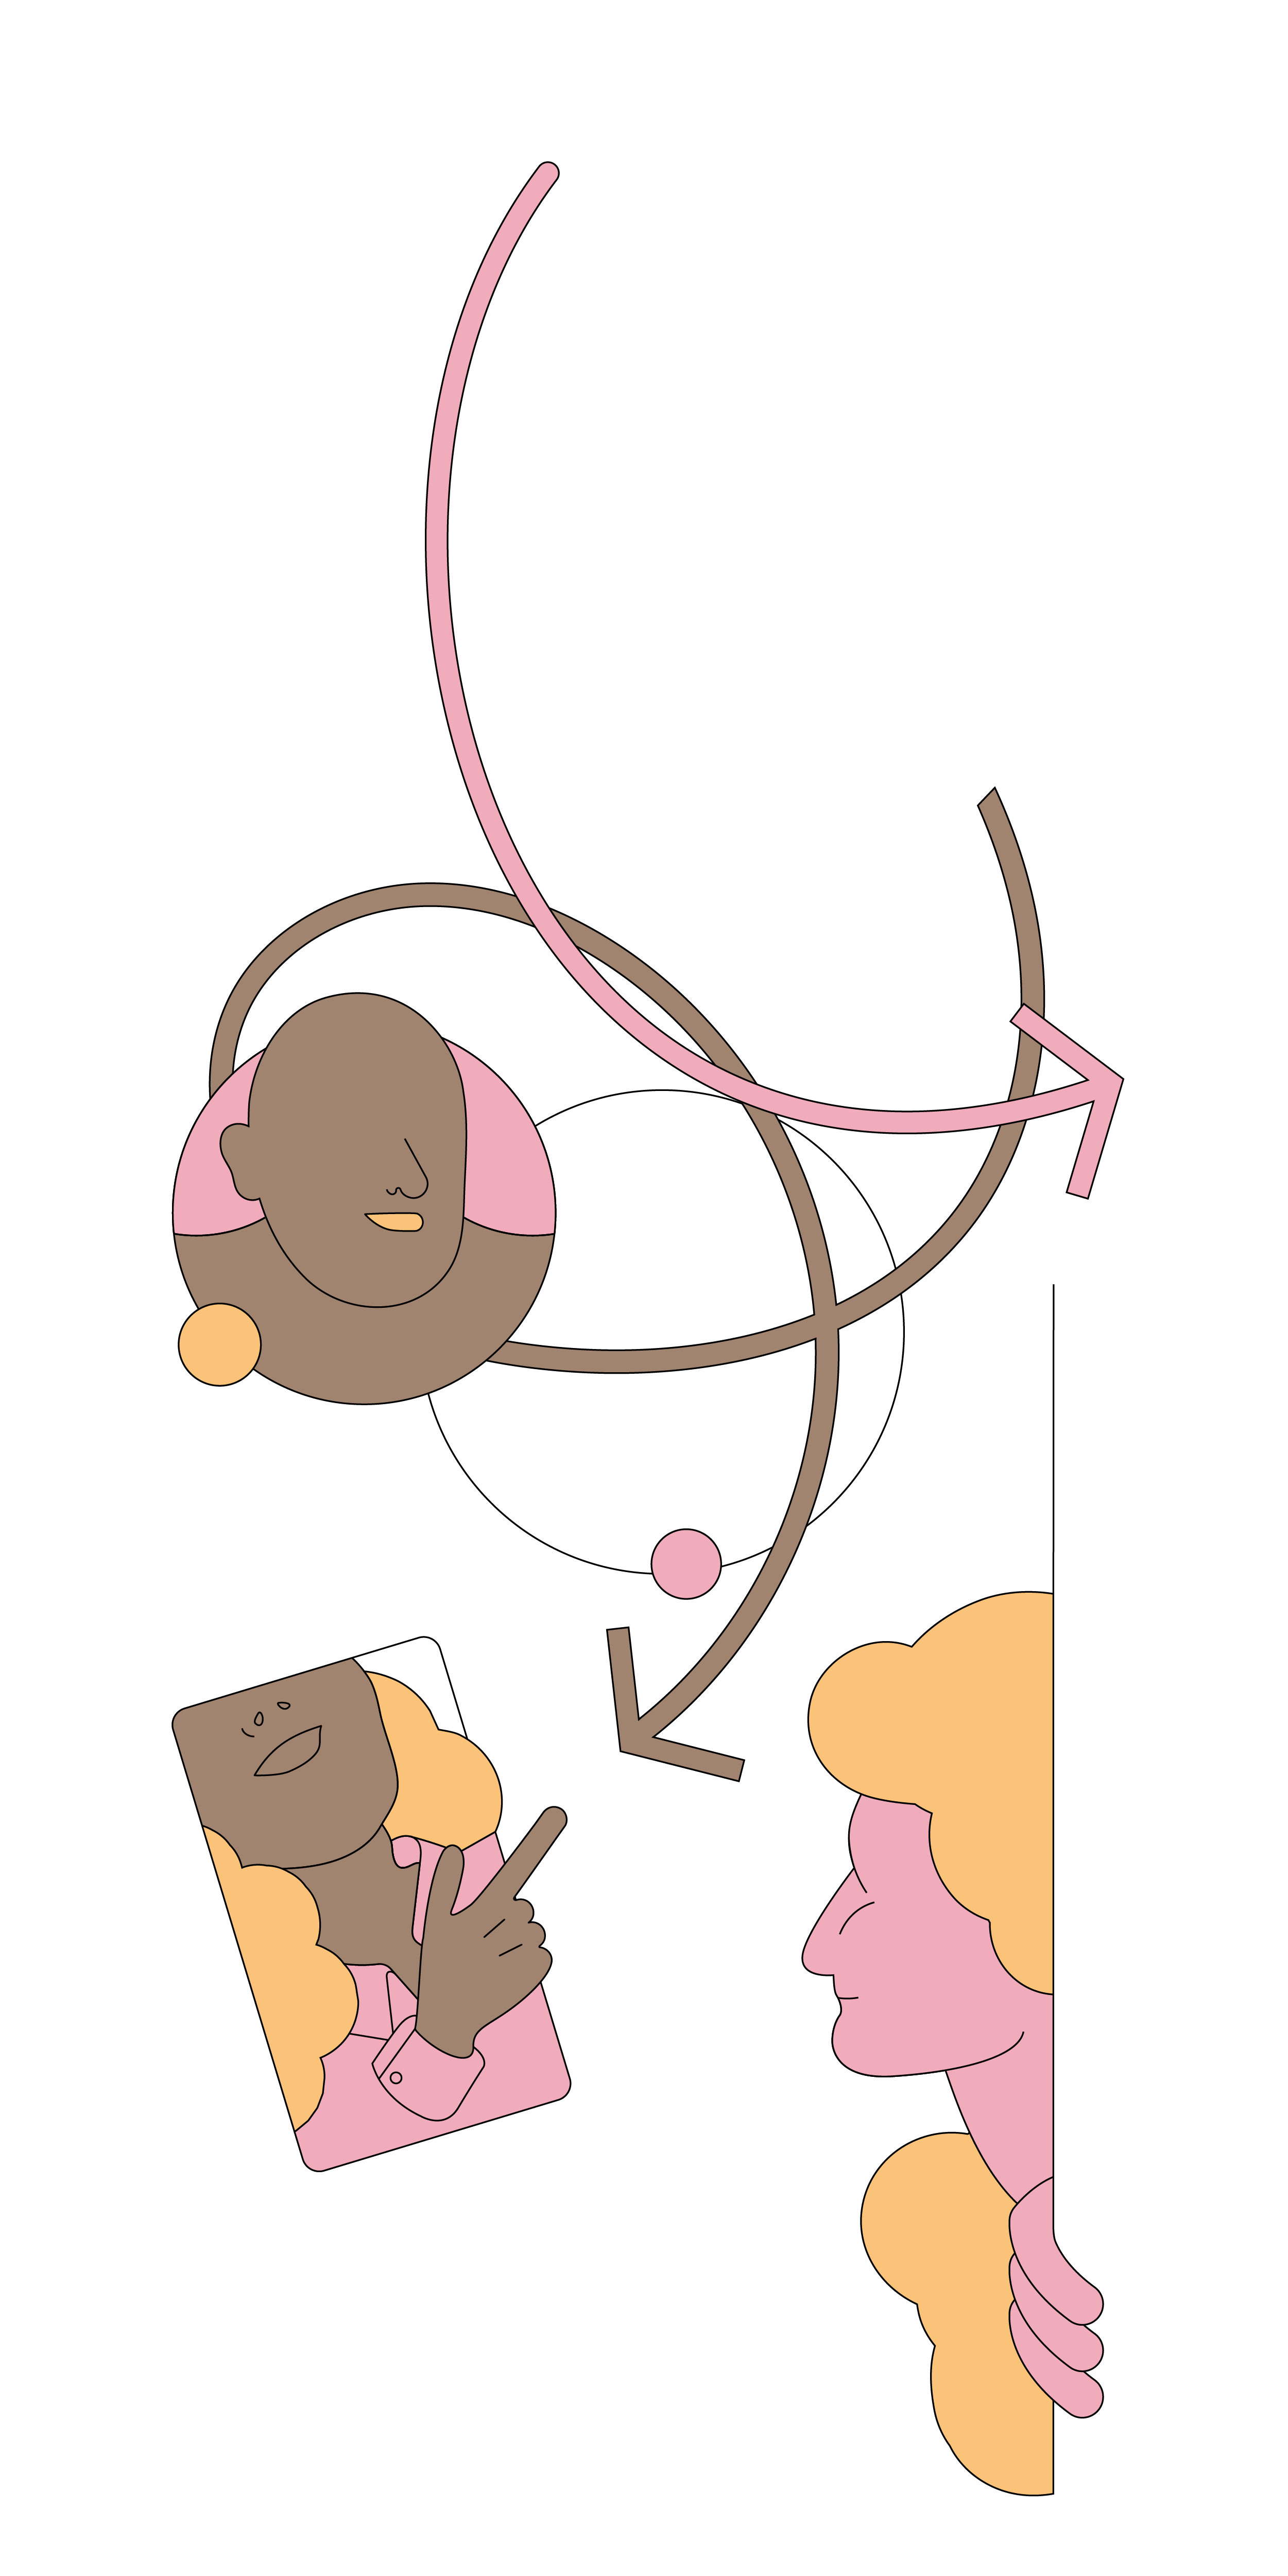 MS10-Web-IllustrationsIMPR-06-1